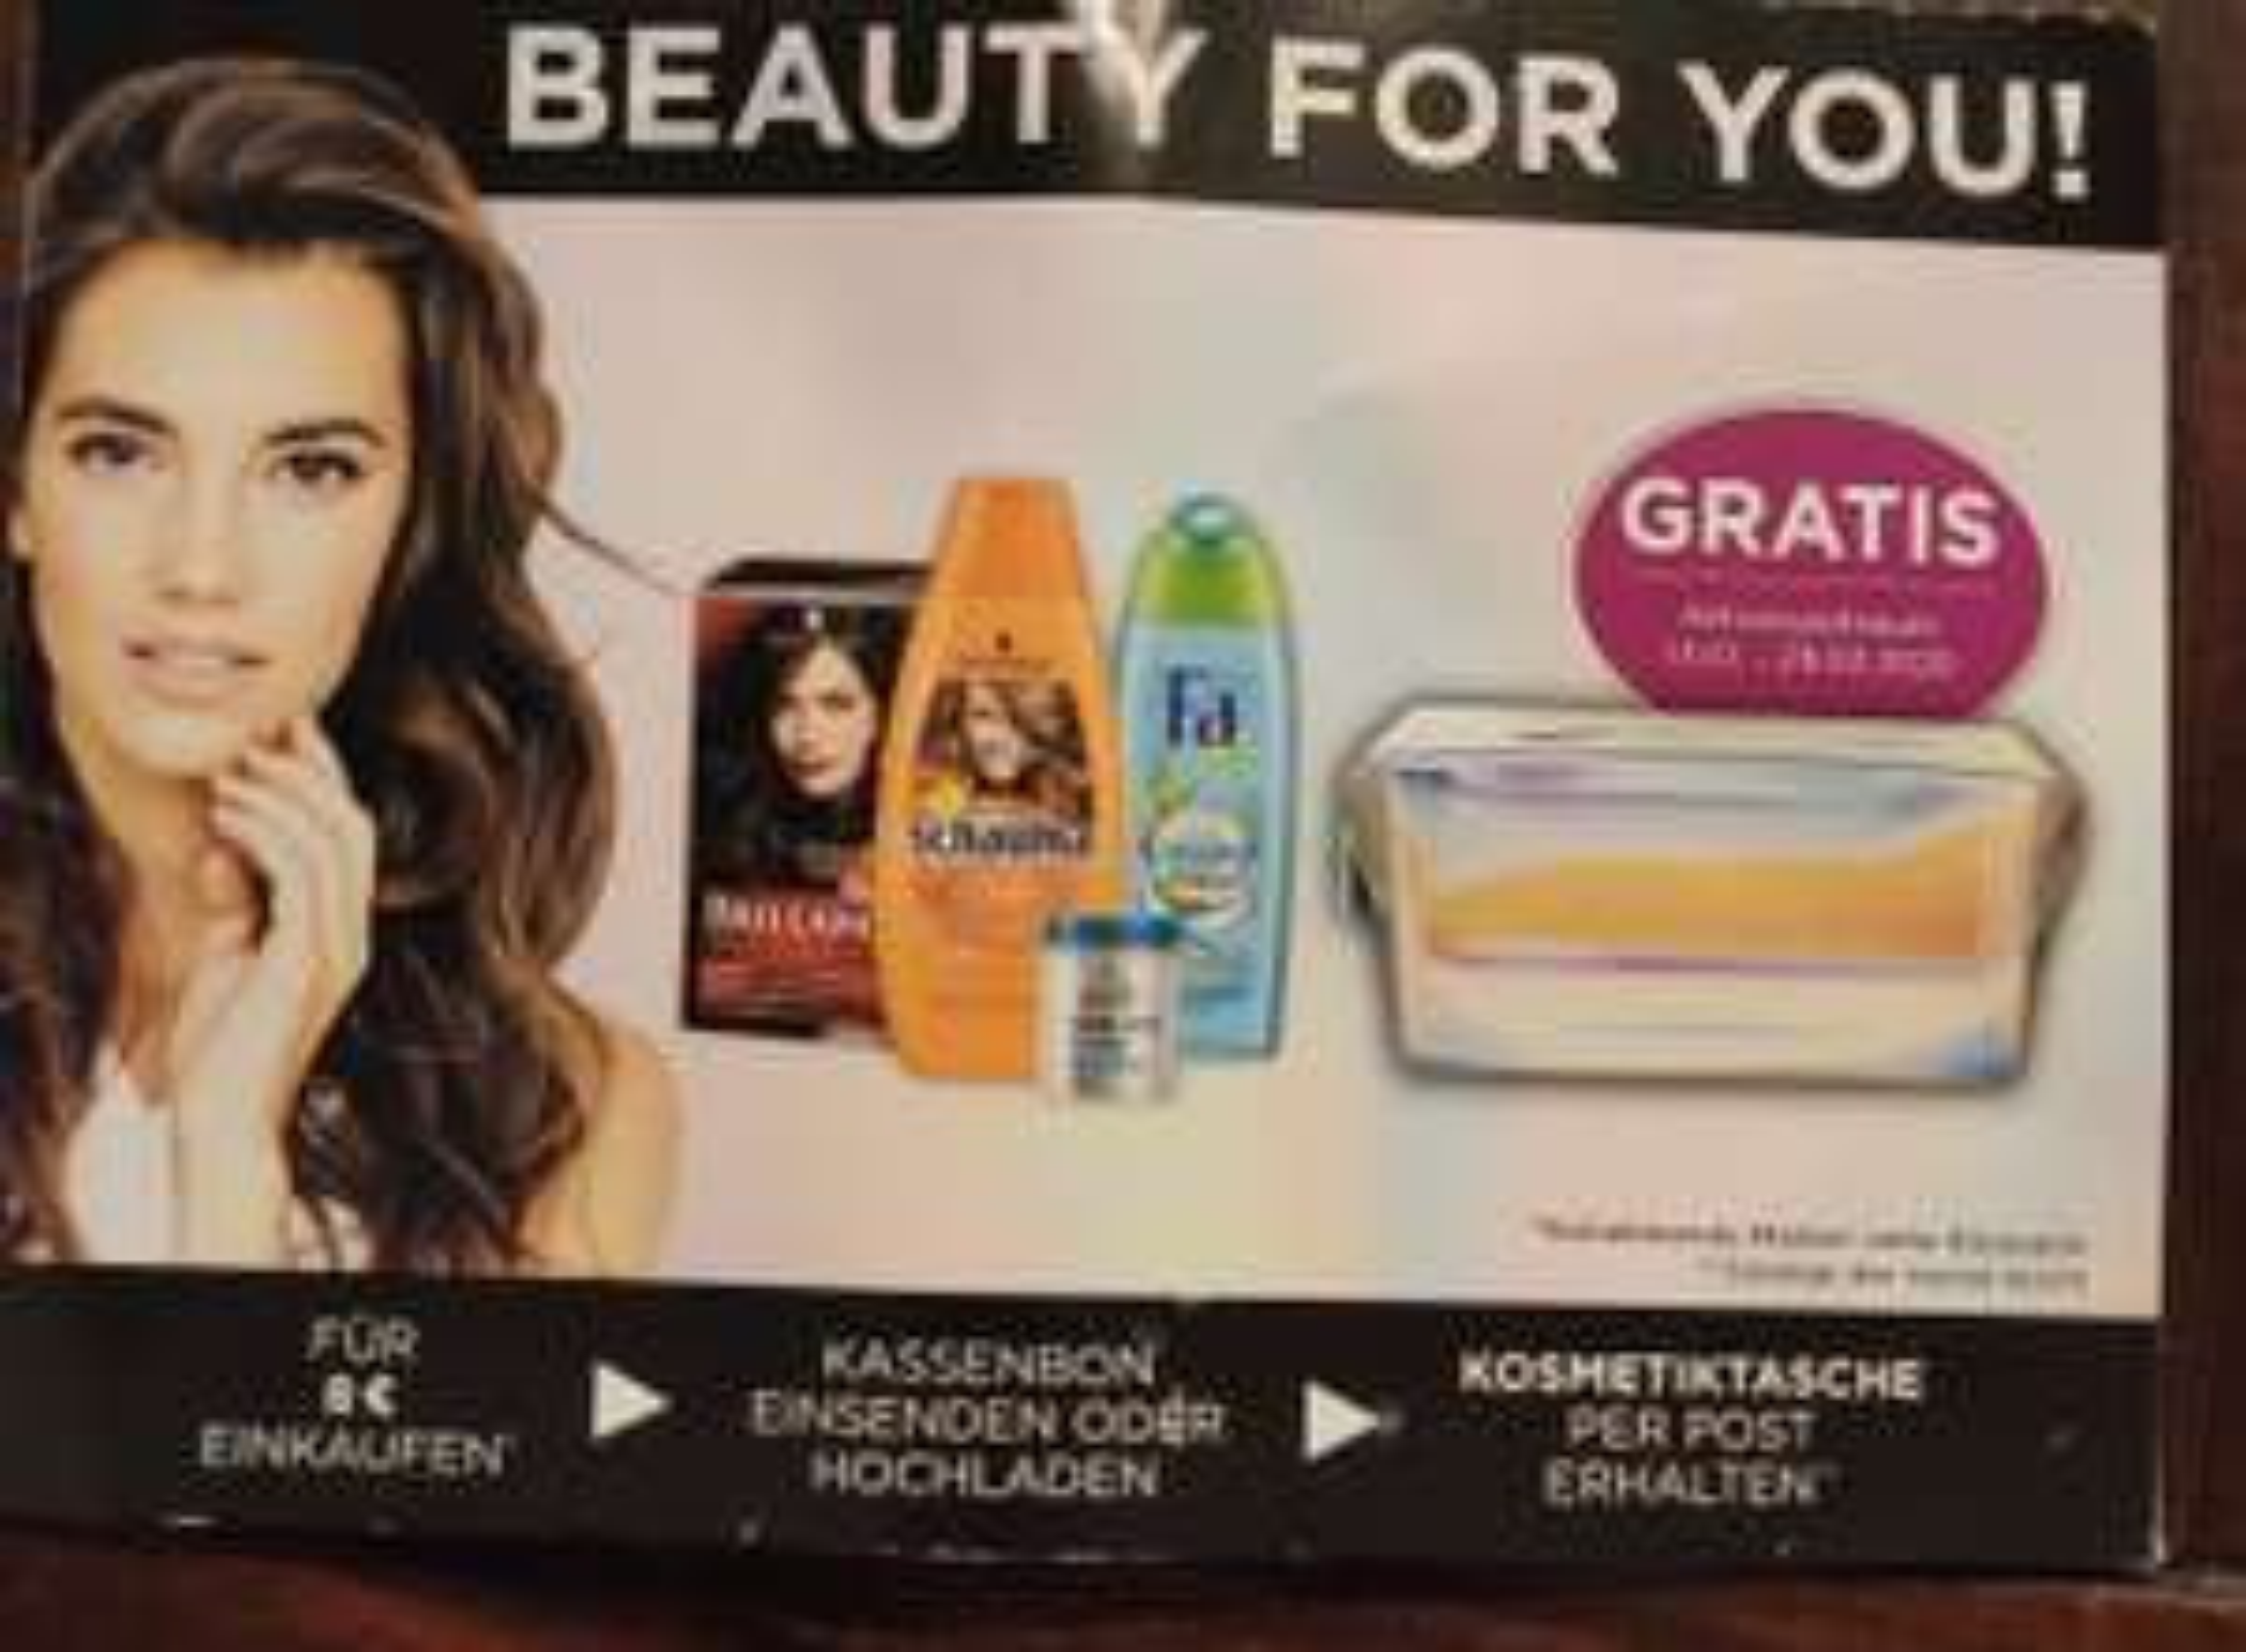 Edeka Beauty for You!!! Gratis Kosmetiktasche. Für 8 Euro Schauma,Fa,Nature Box, Schwarzkopf,Syoss kaufen